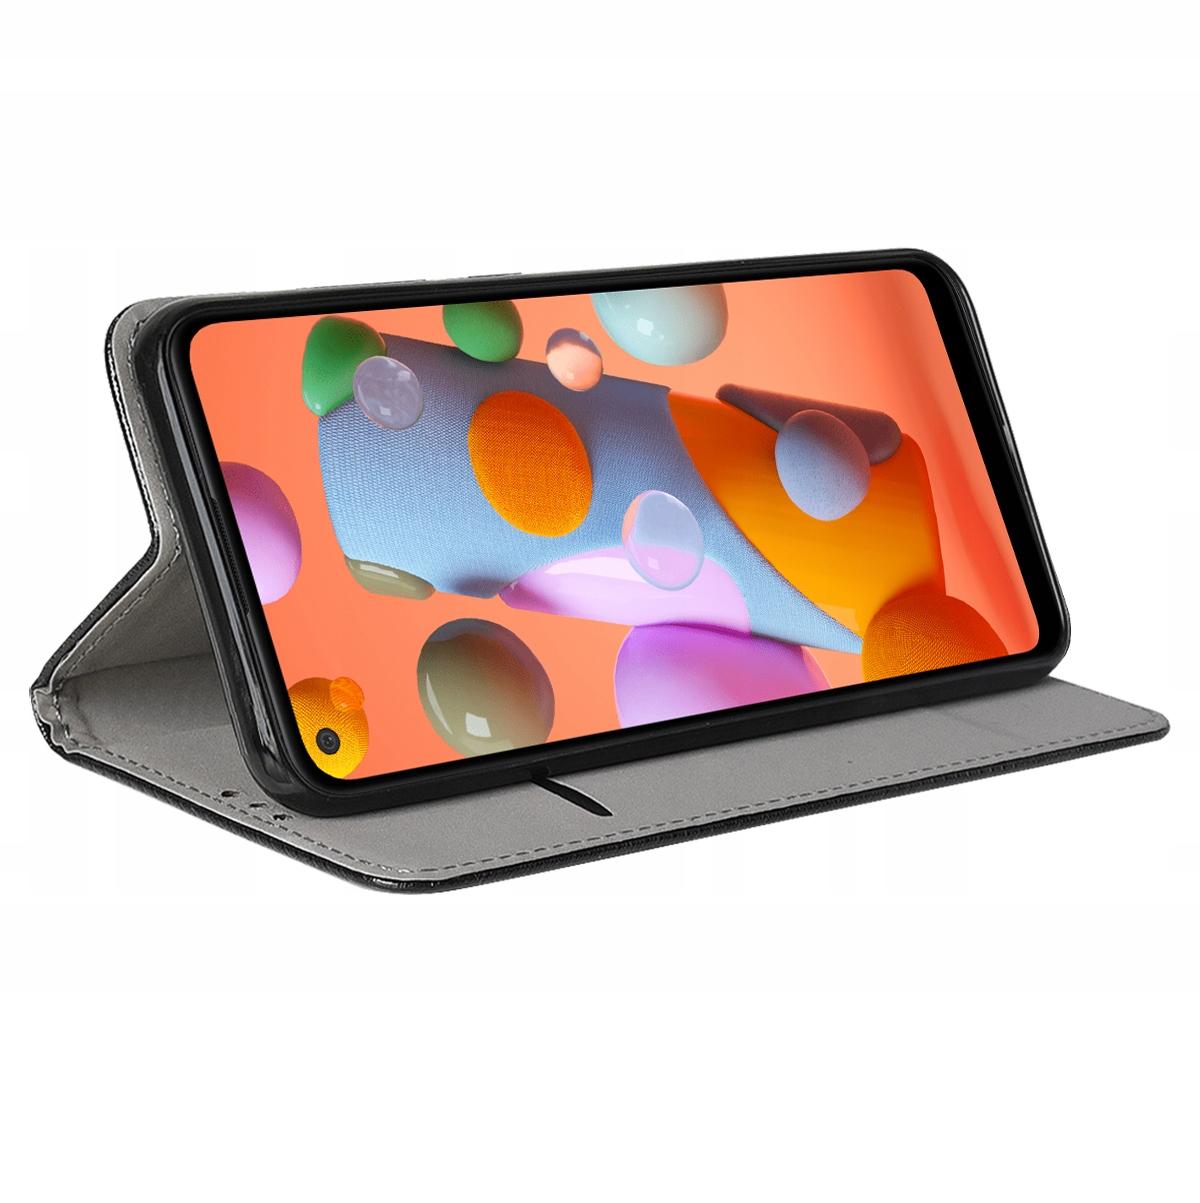 Etui do Motorola Moto G9 Plus Case Magnet + Szkło Producent inny